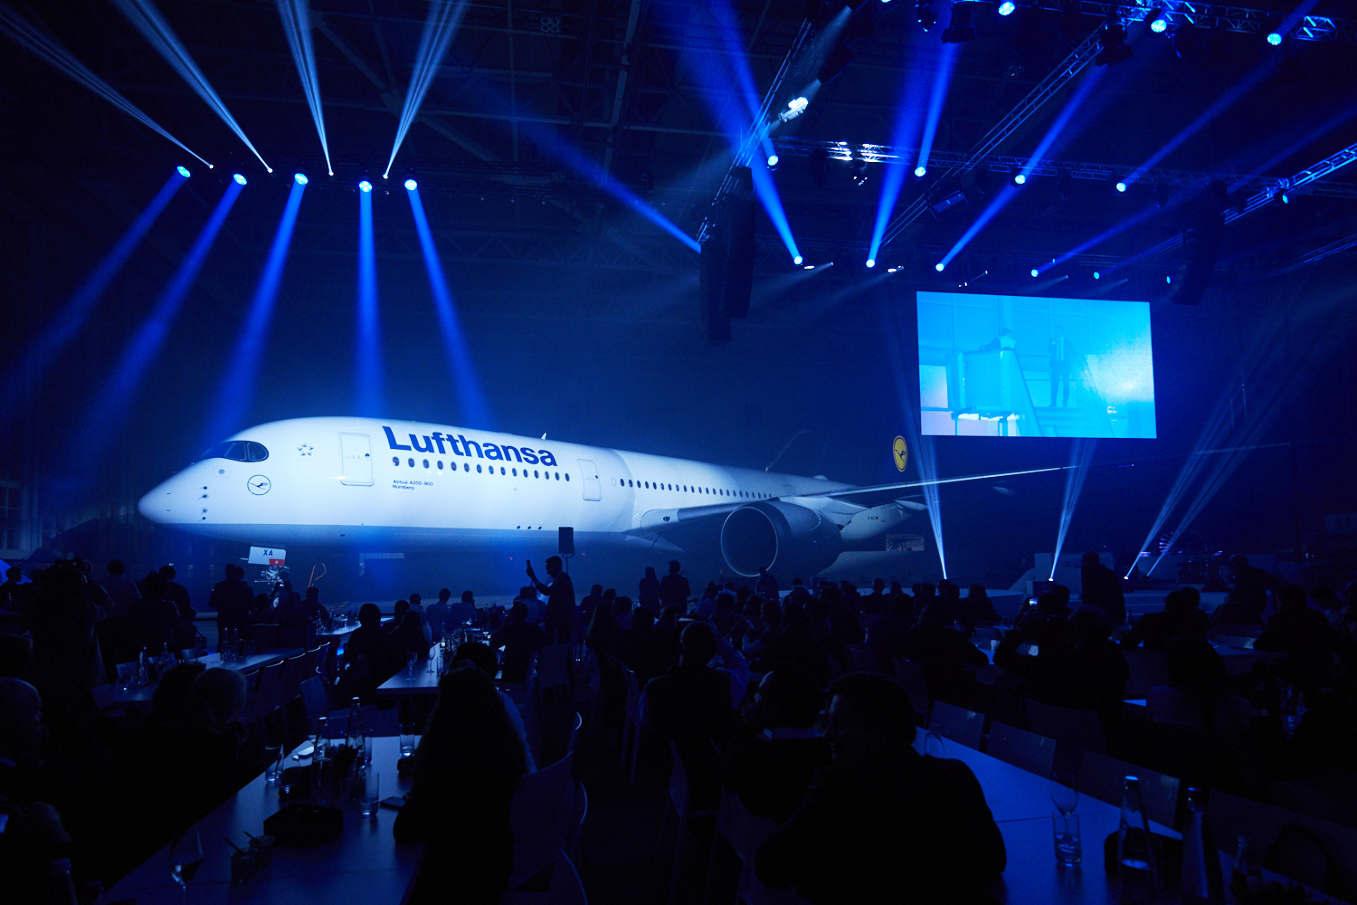 Lufthansa unveils A350-900 innovations